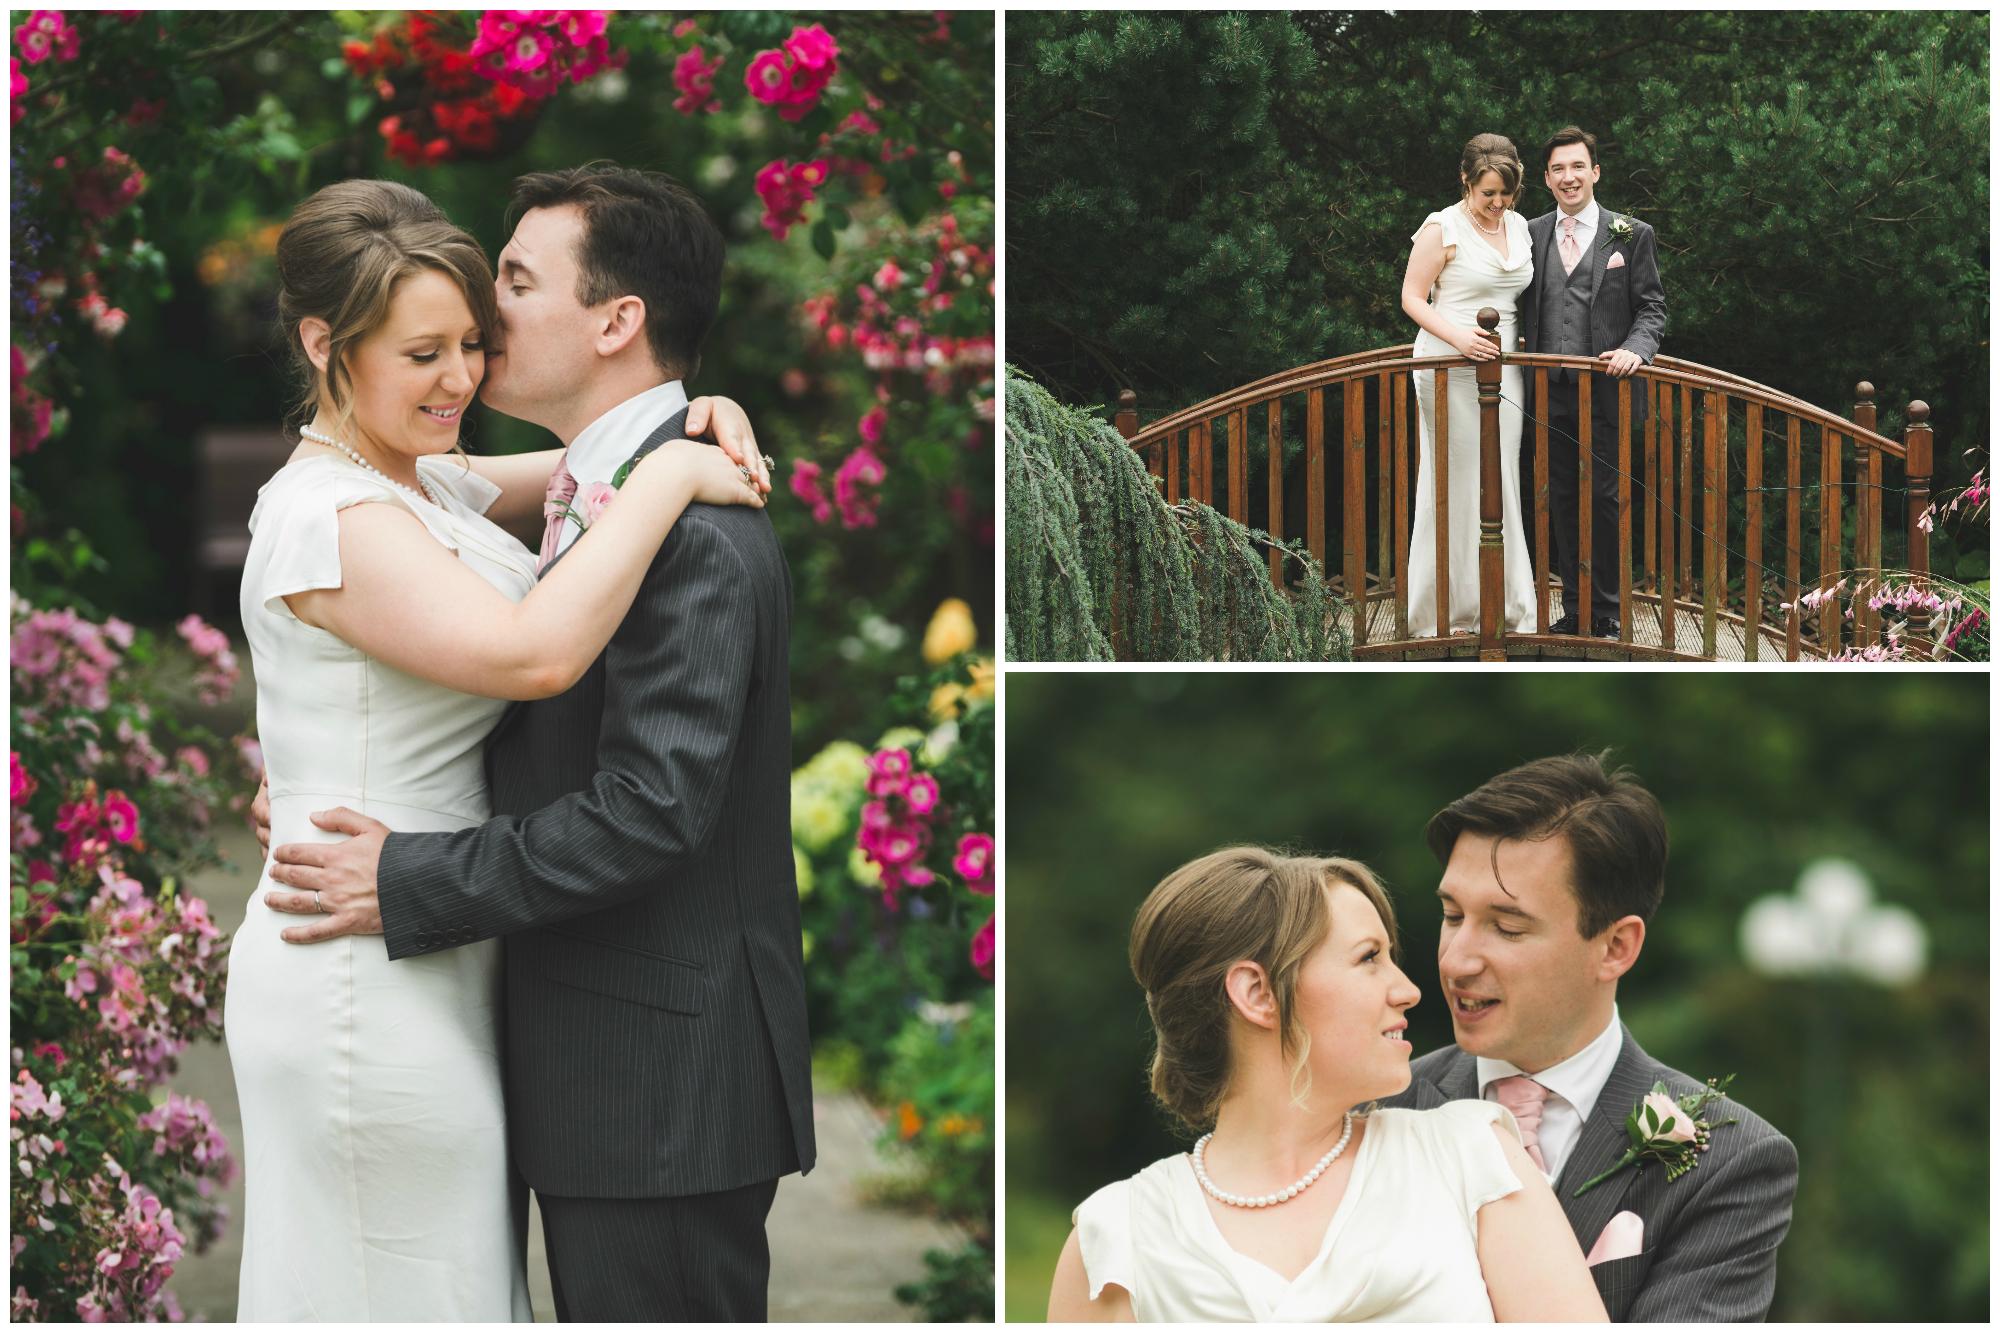 Canal Court Hotel Newry Wedding photographer Pure Photo N.I bride groom portraits